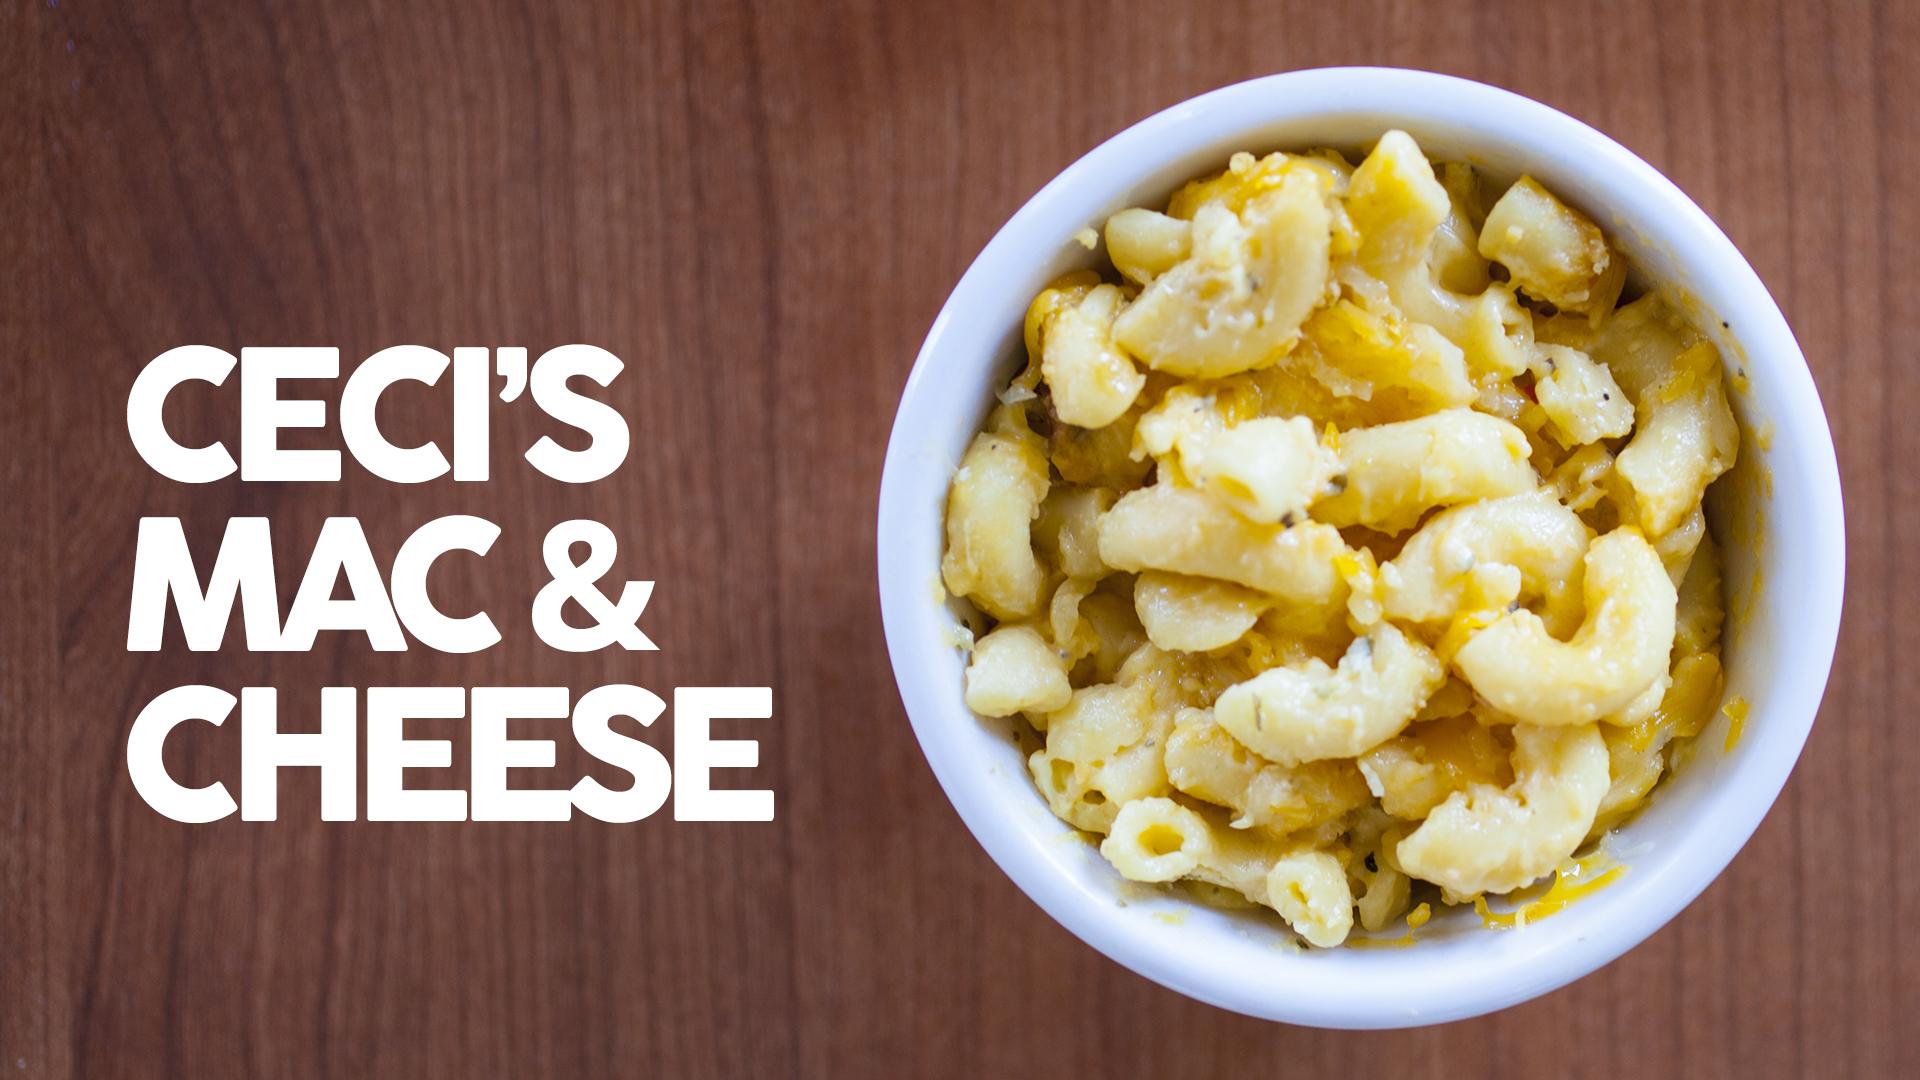 Cheesy Ceci's Mac & Cheese